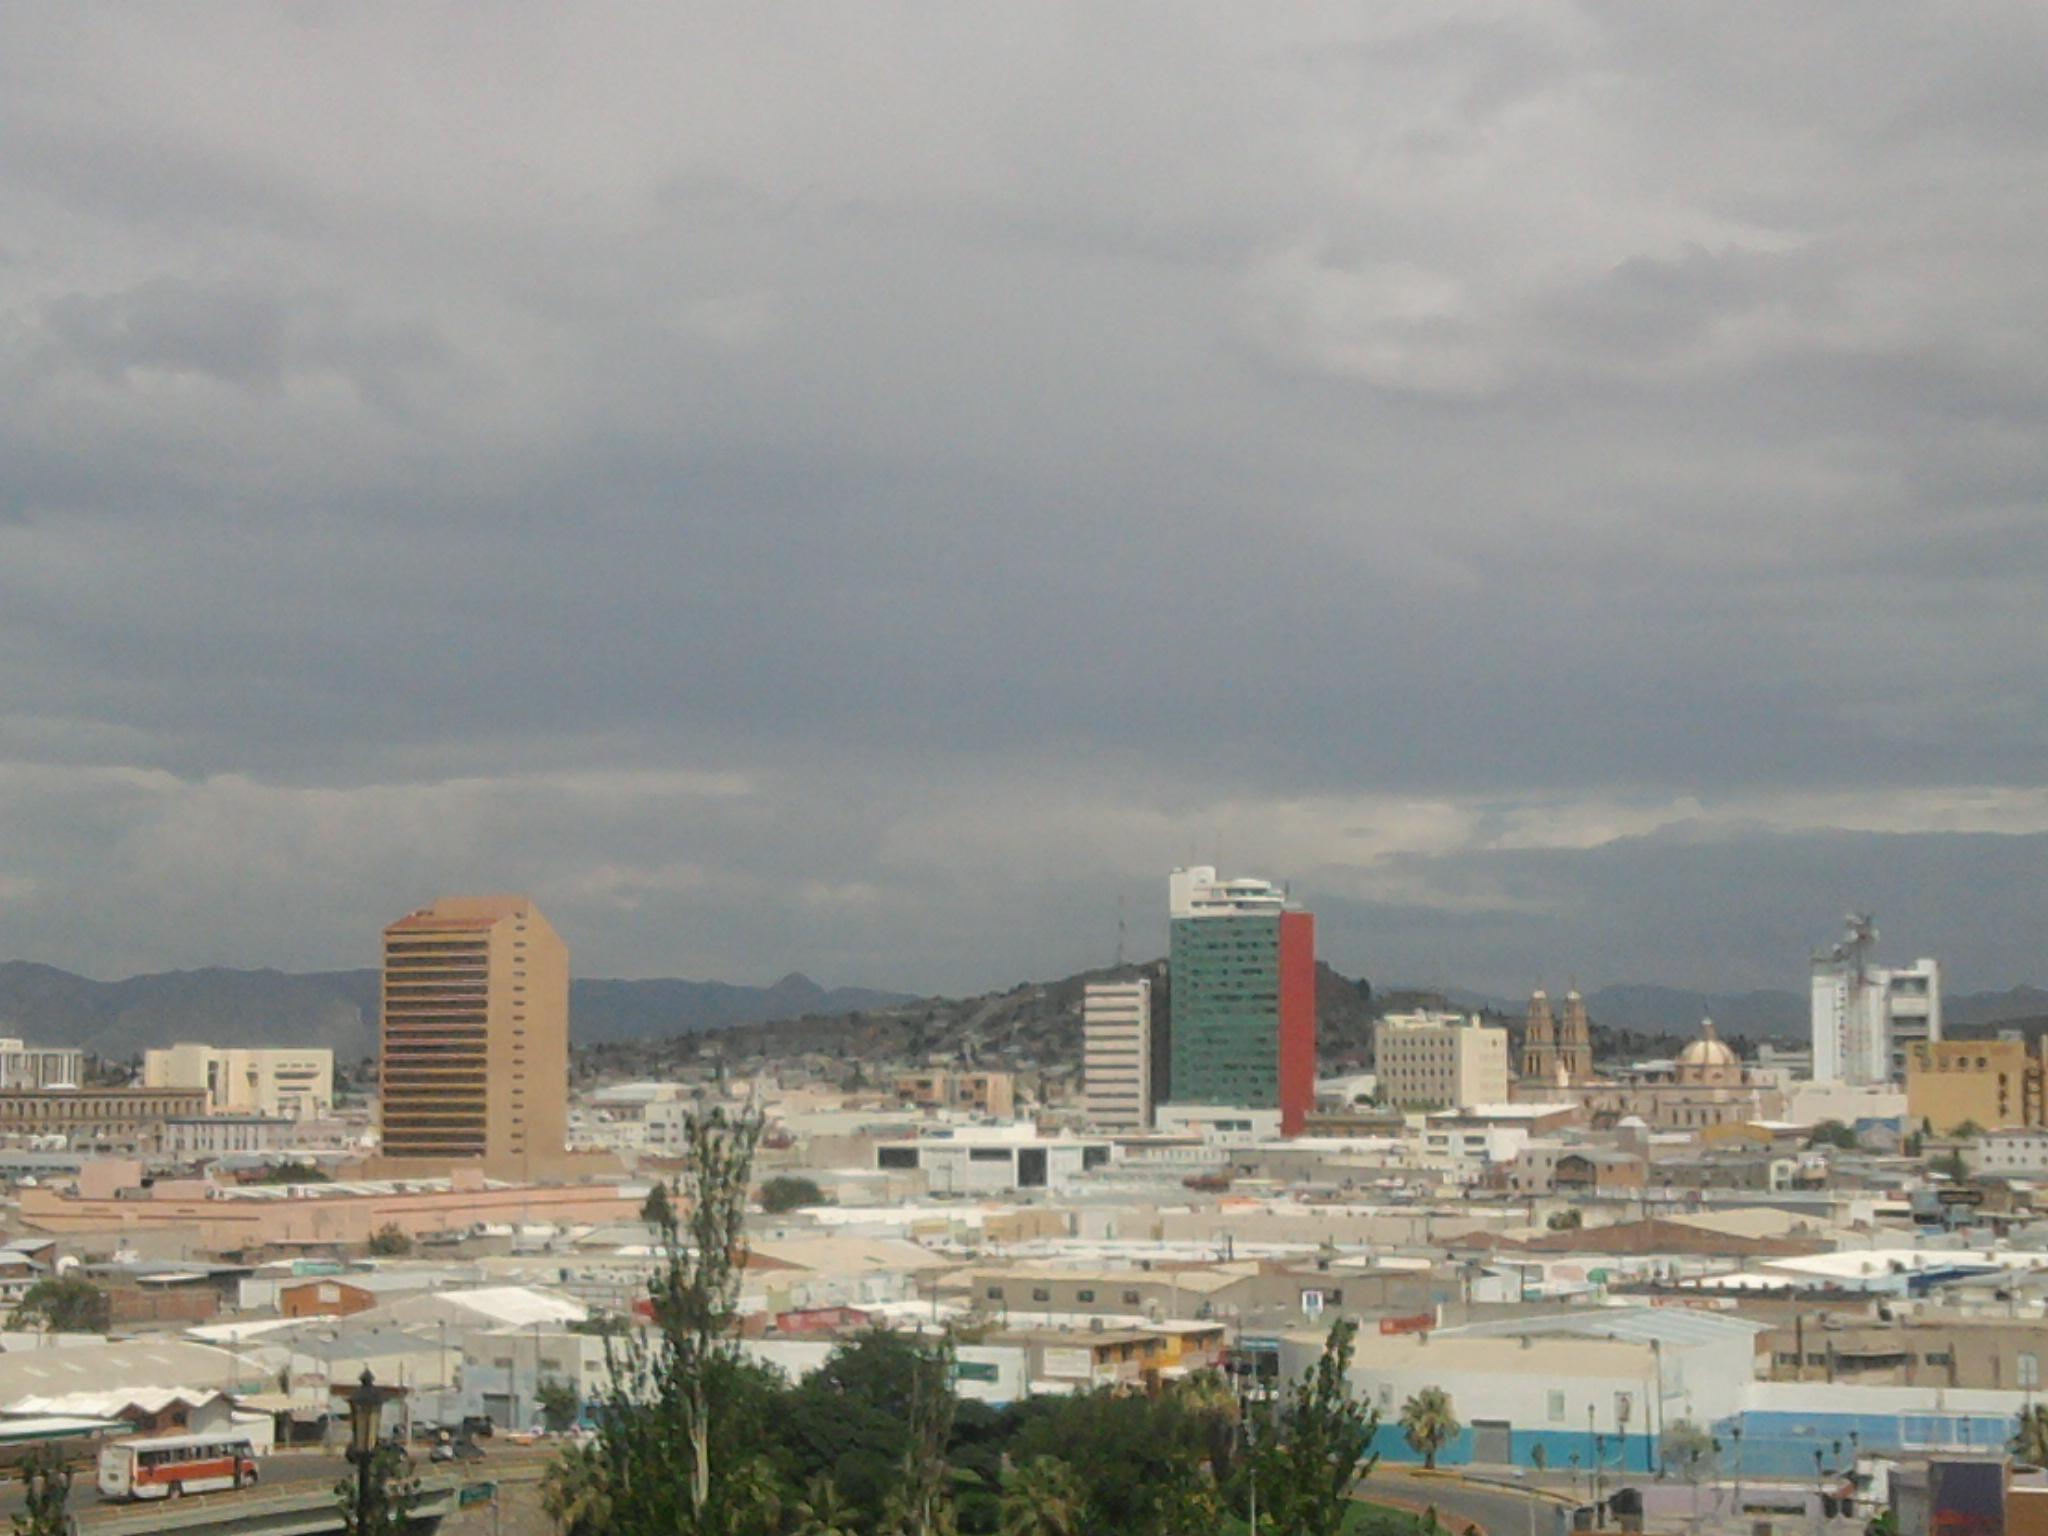 Skyline de chihuahua